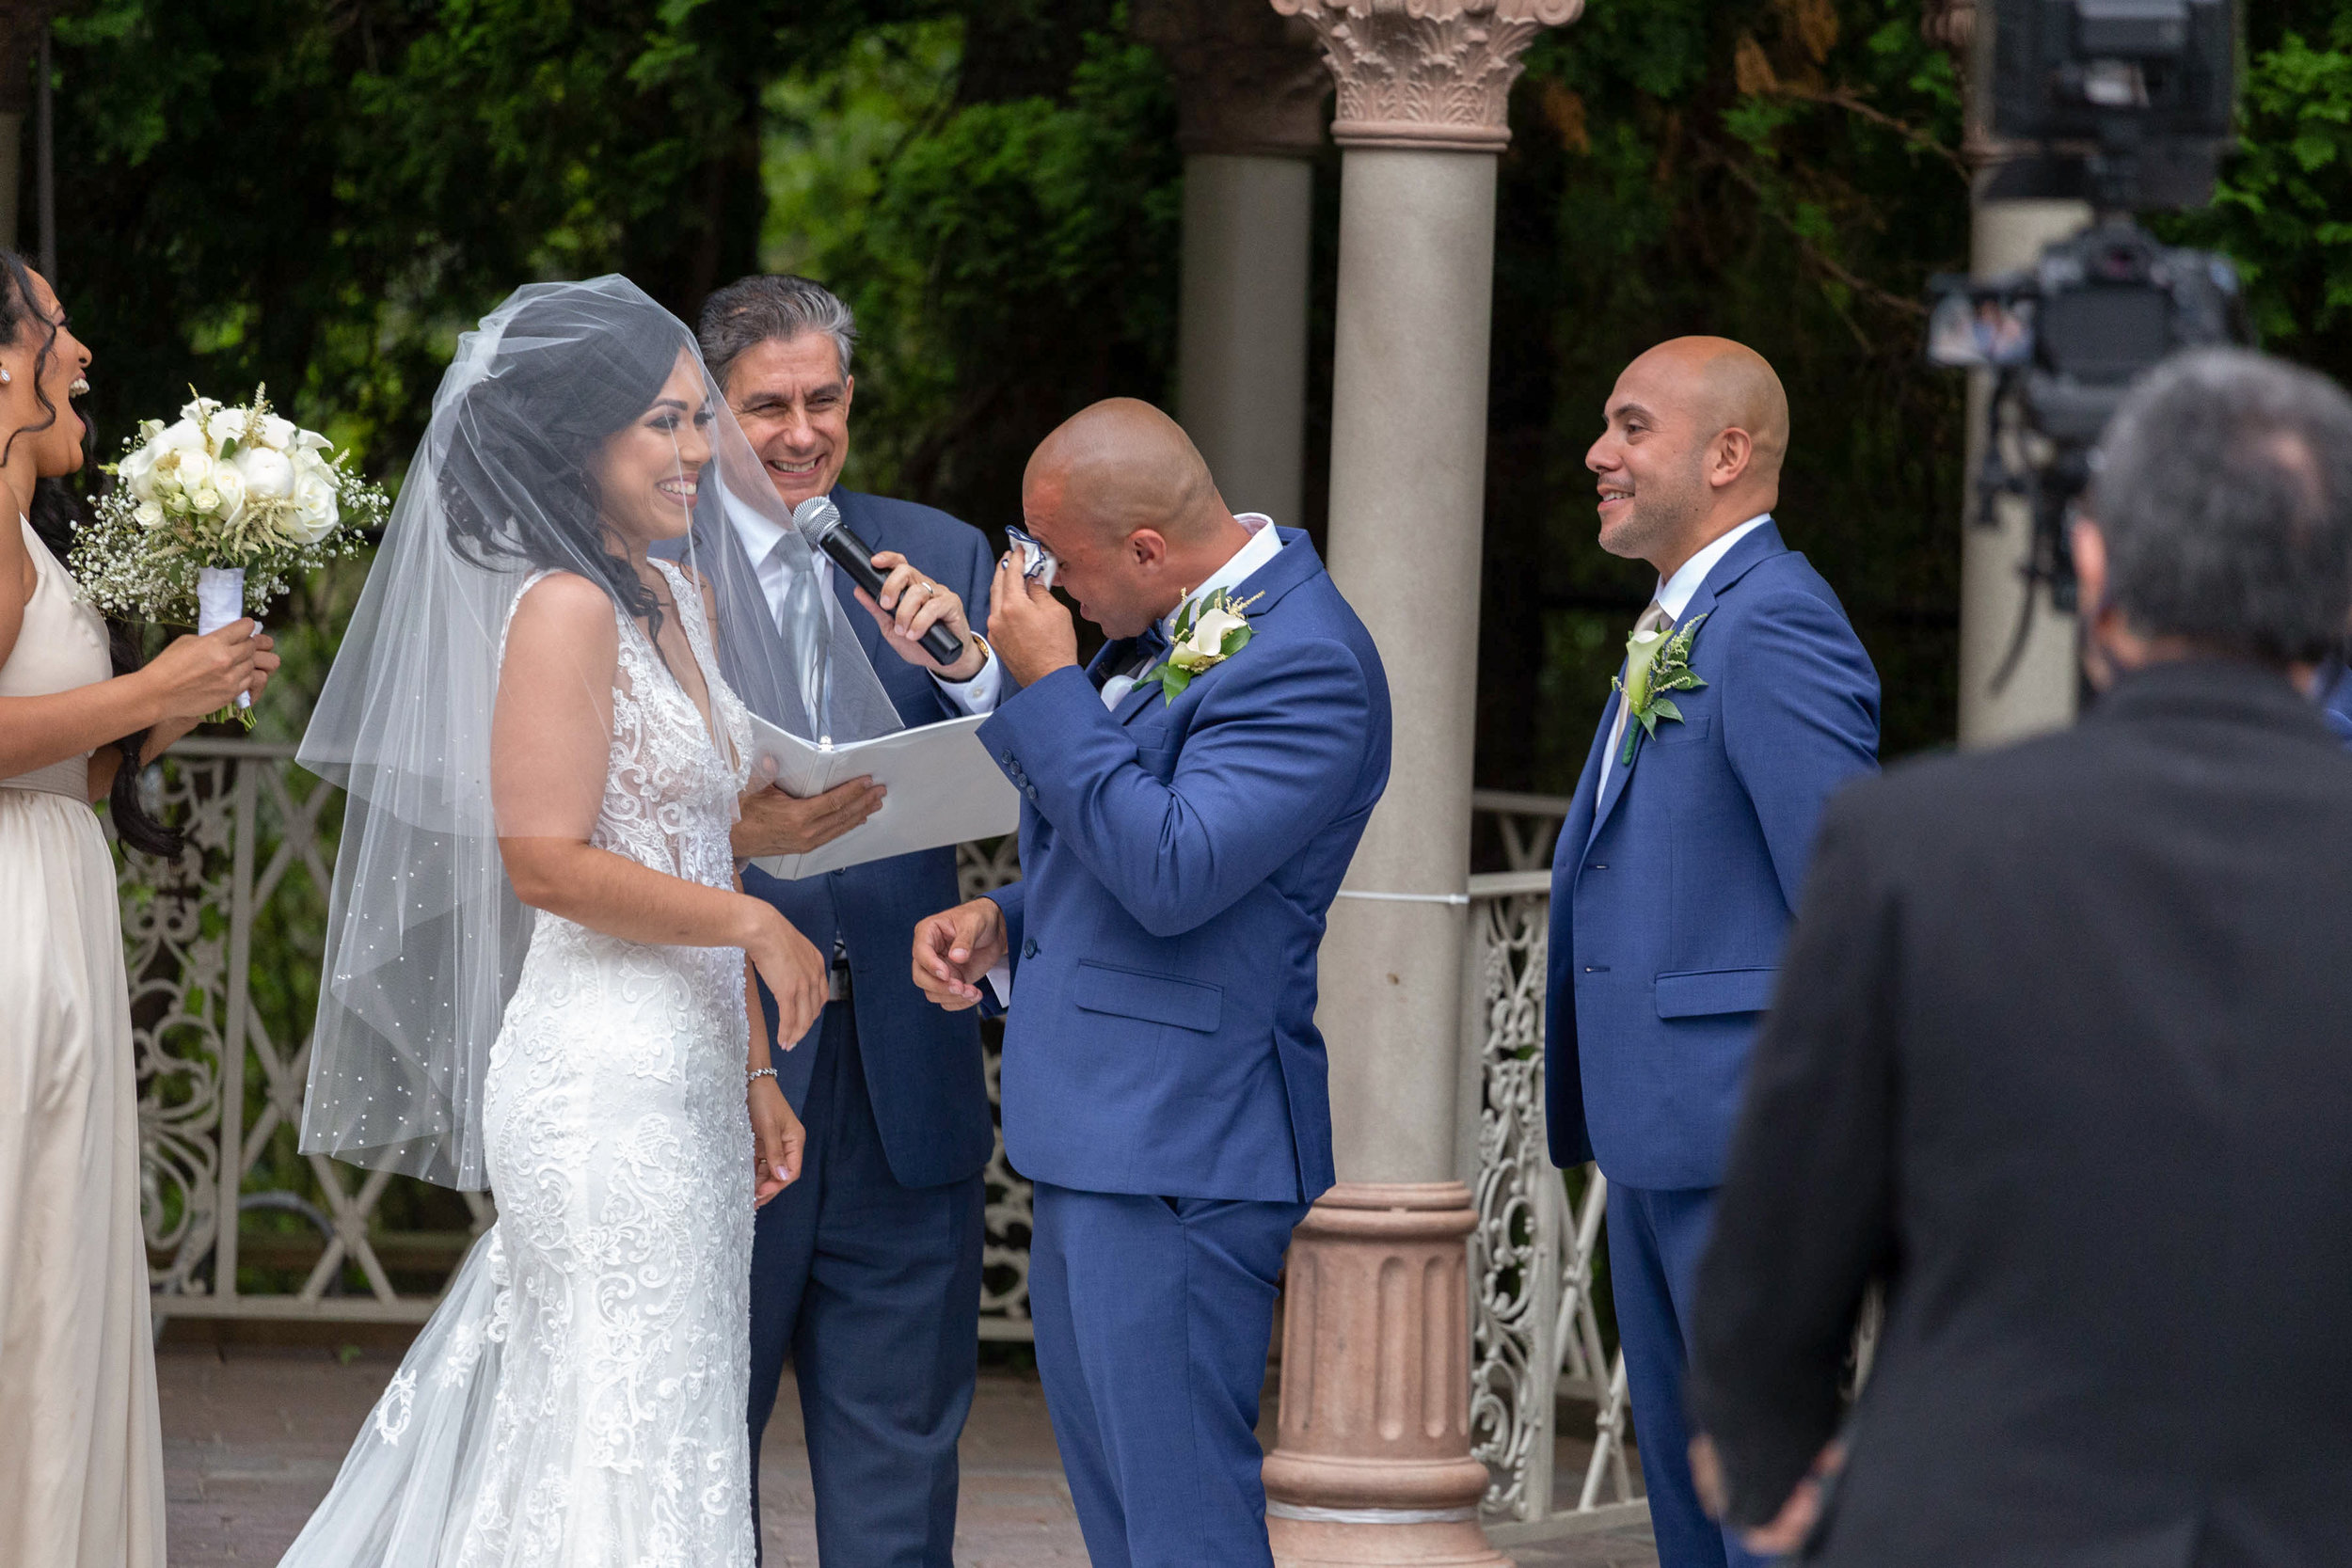 Outdoor wedding ceremony ideas.jpg